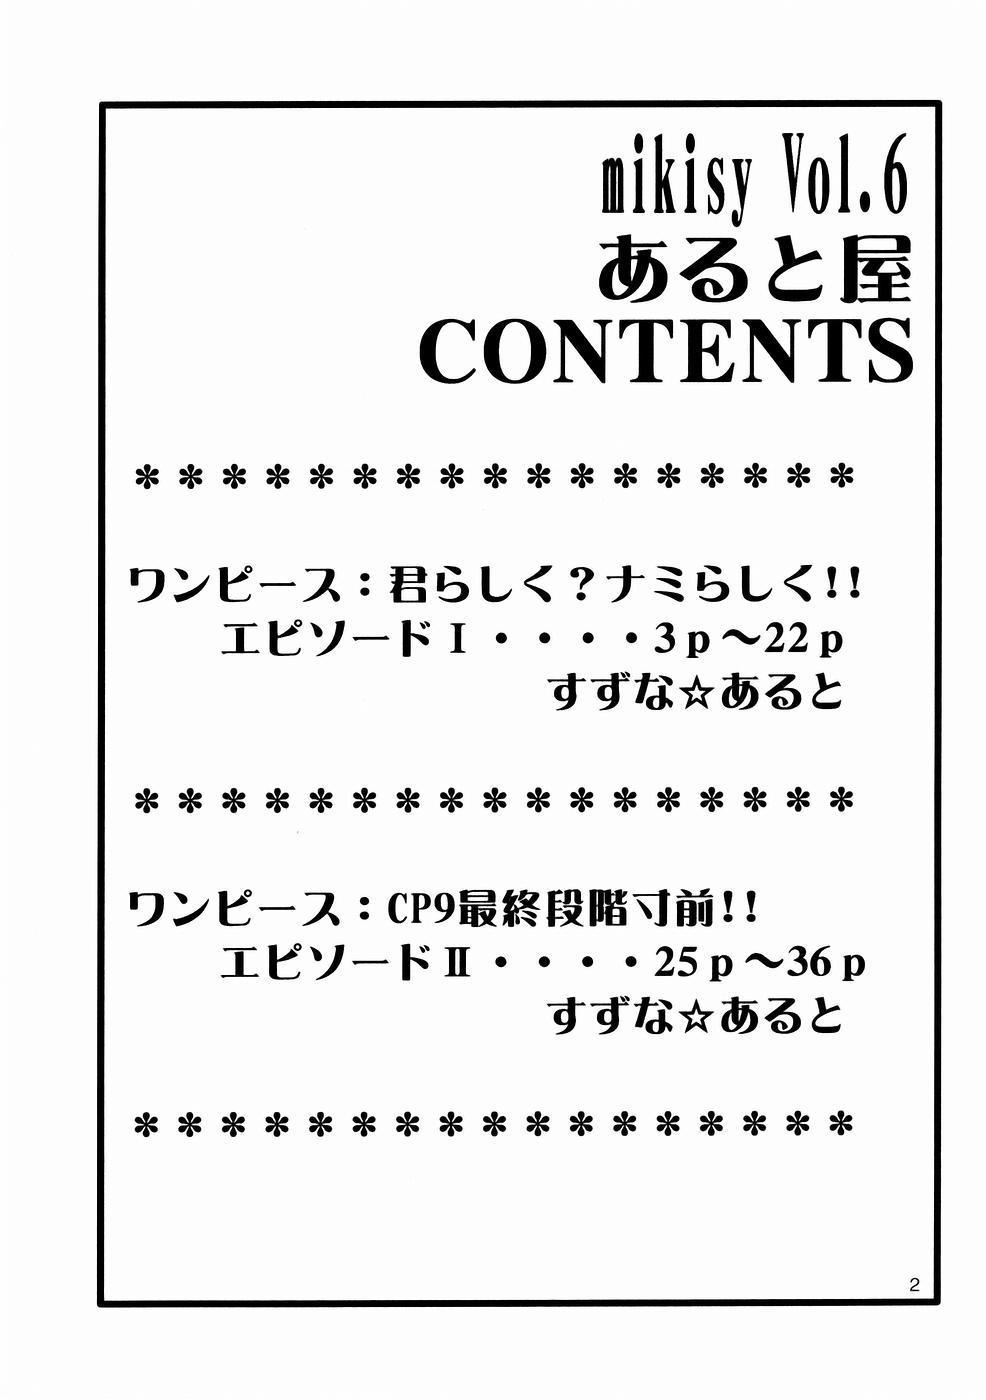 Mikisy Vol. 6 2